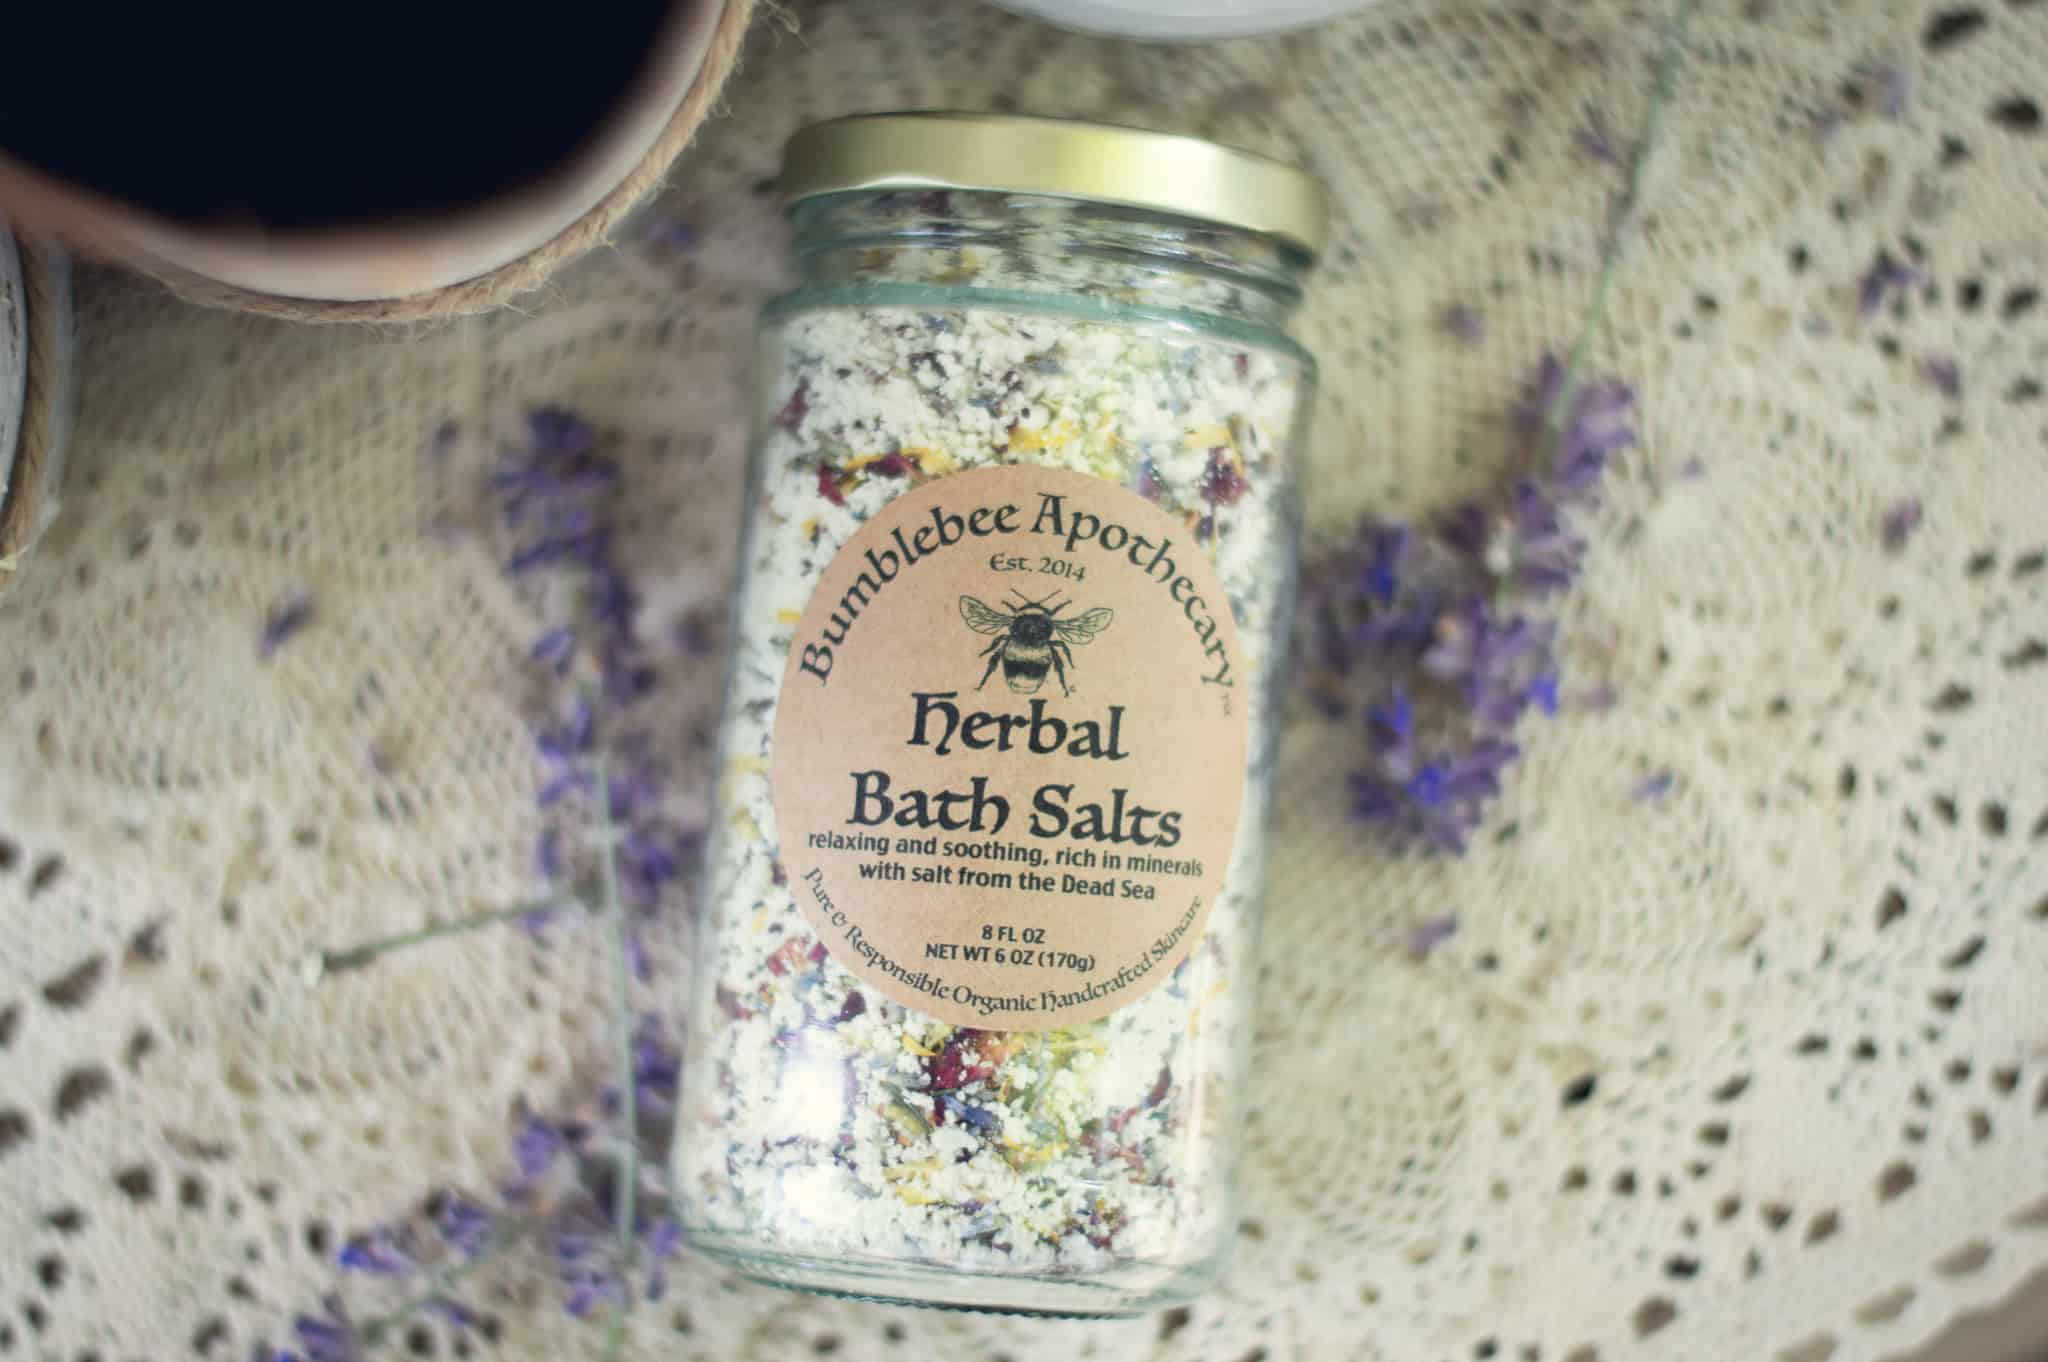 Herbal bath salts recipe Dead Sea salt